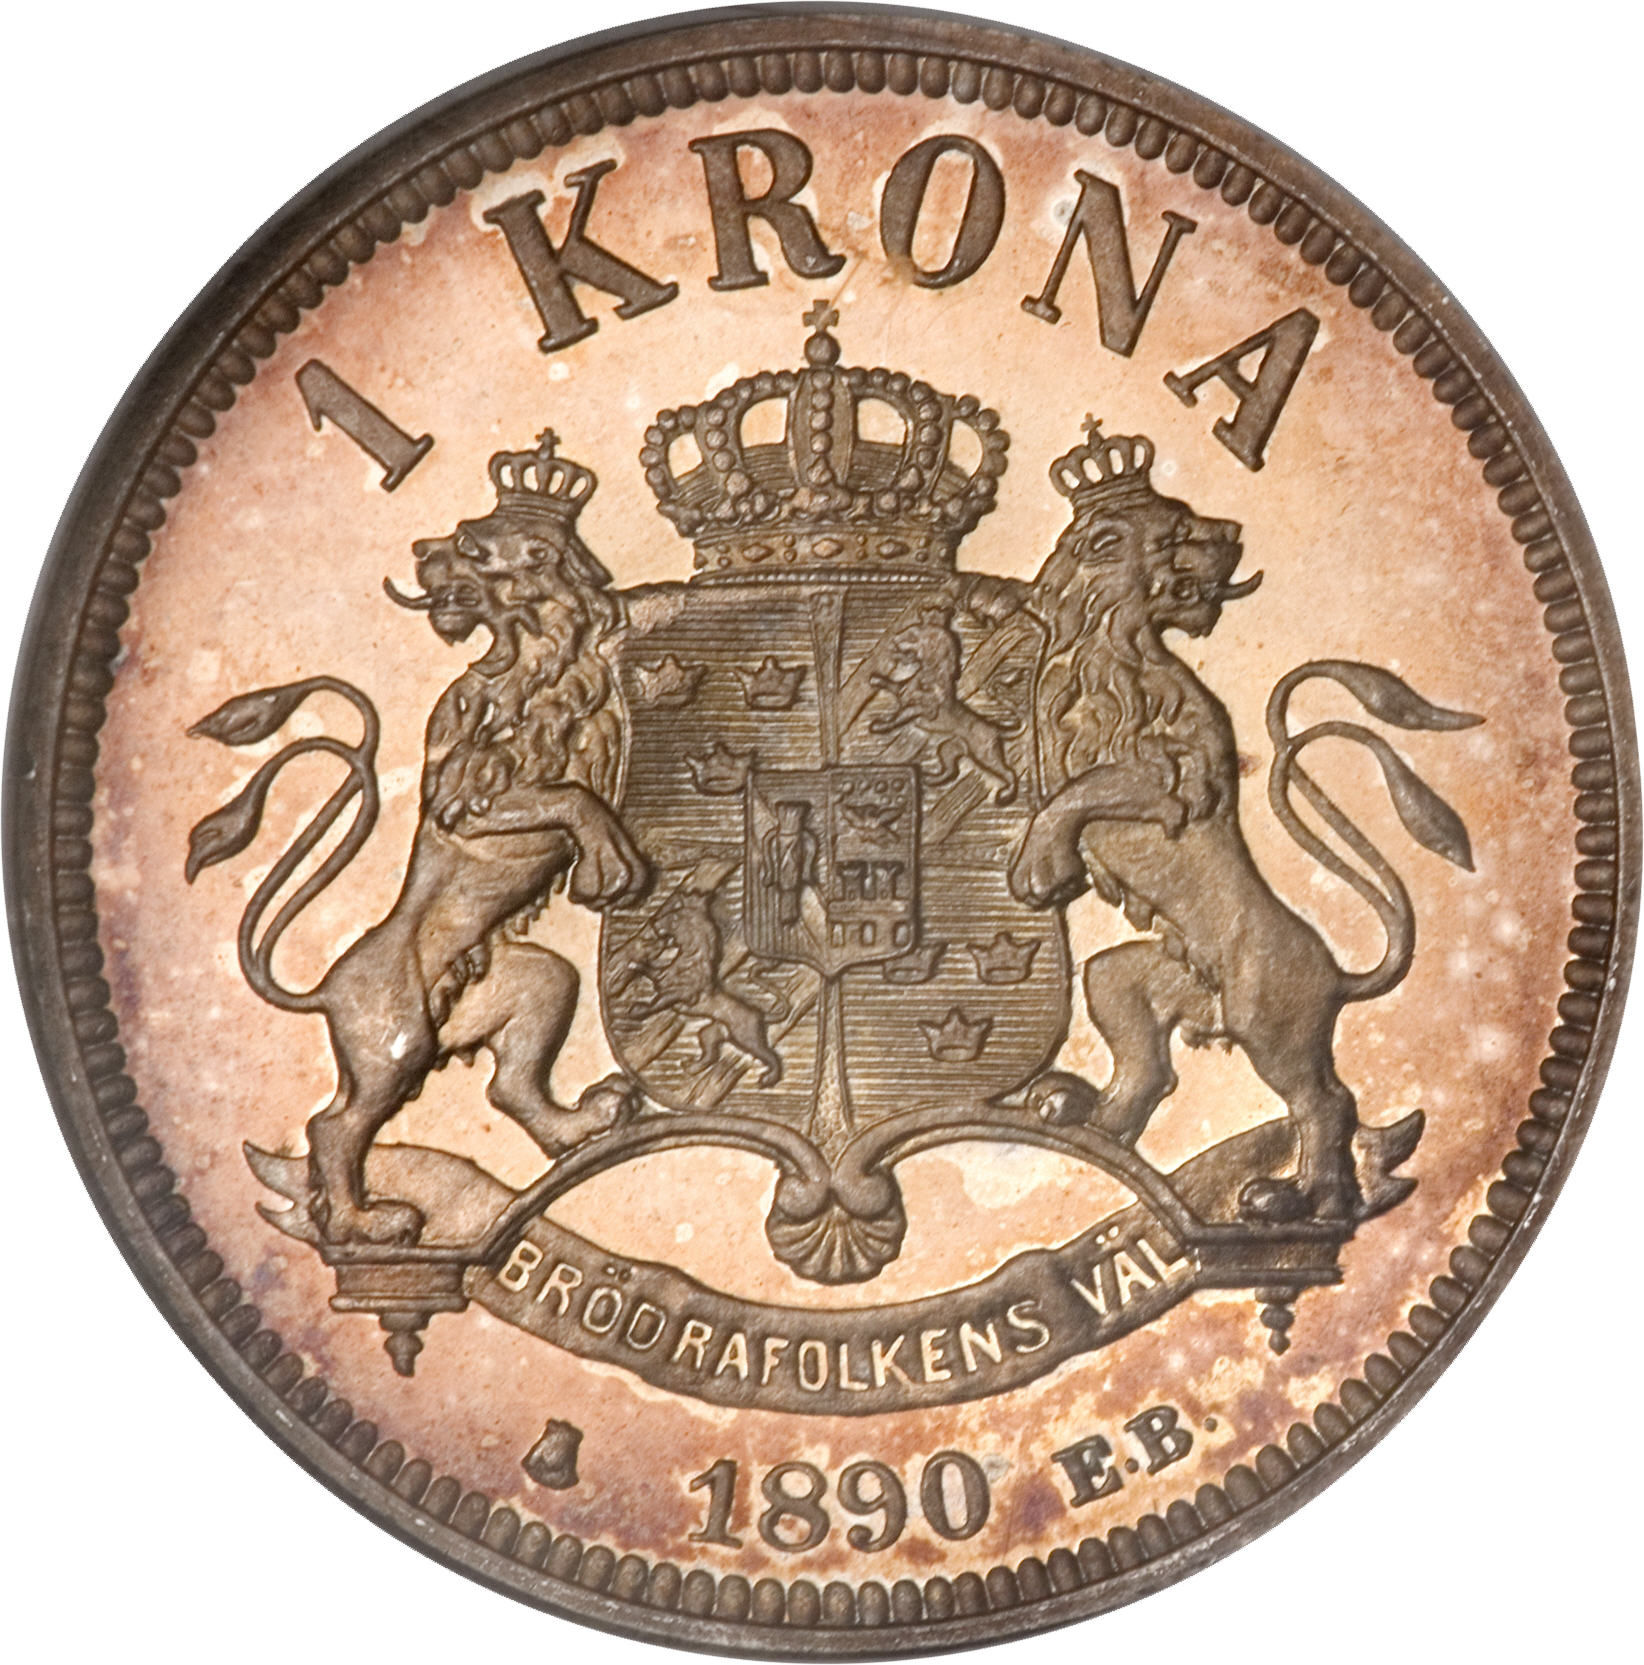 1 Krona - Oscar II - Without initials below bust (1890 ...